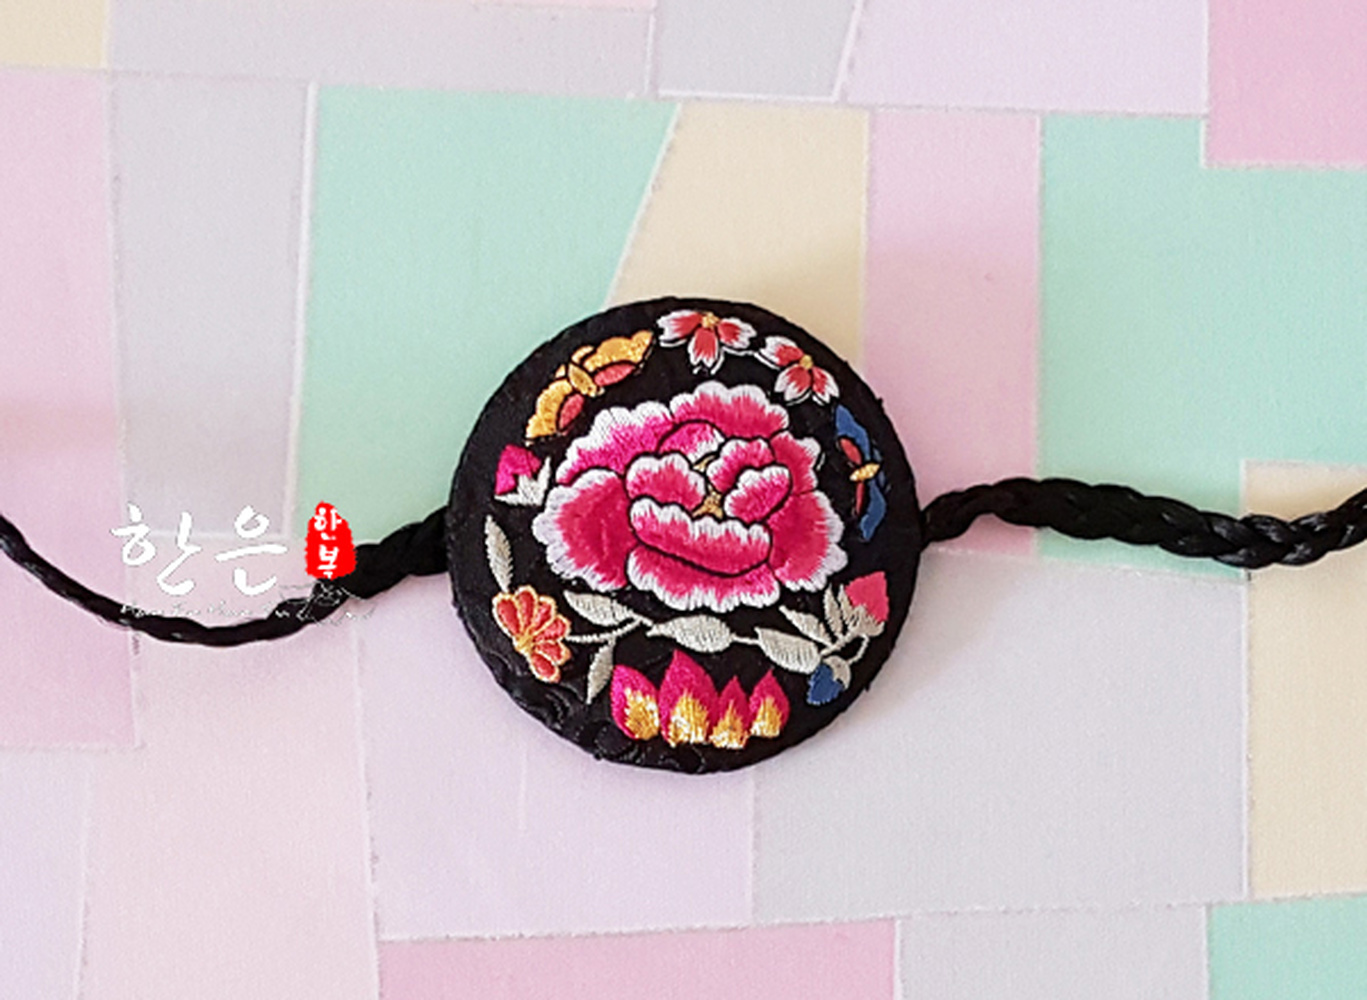 South Korea Imported Korean Clothing Hair Bands  Korean Hair Accessories New Hair Rope  Hair Bands  Girls Hair Accessories